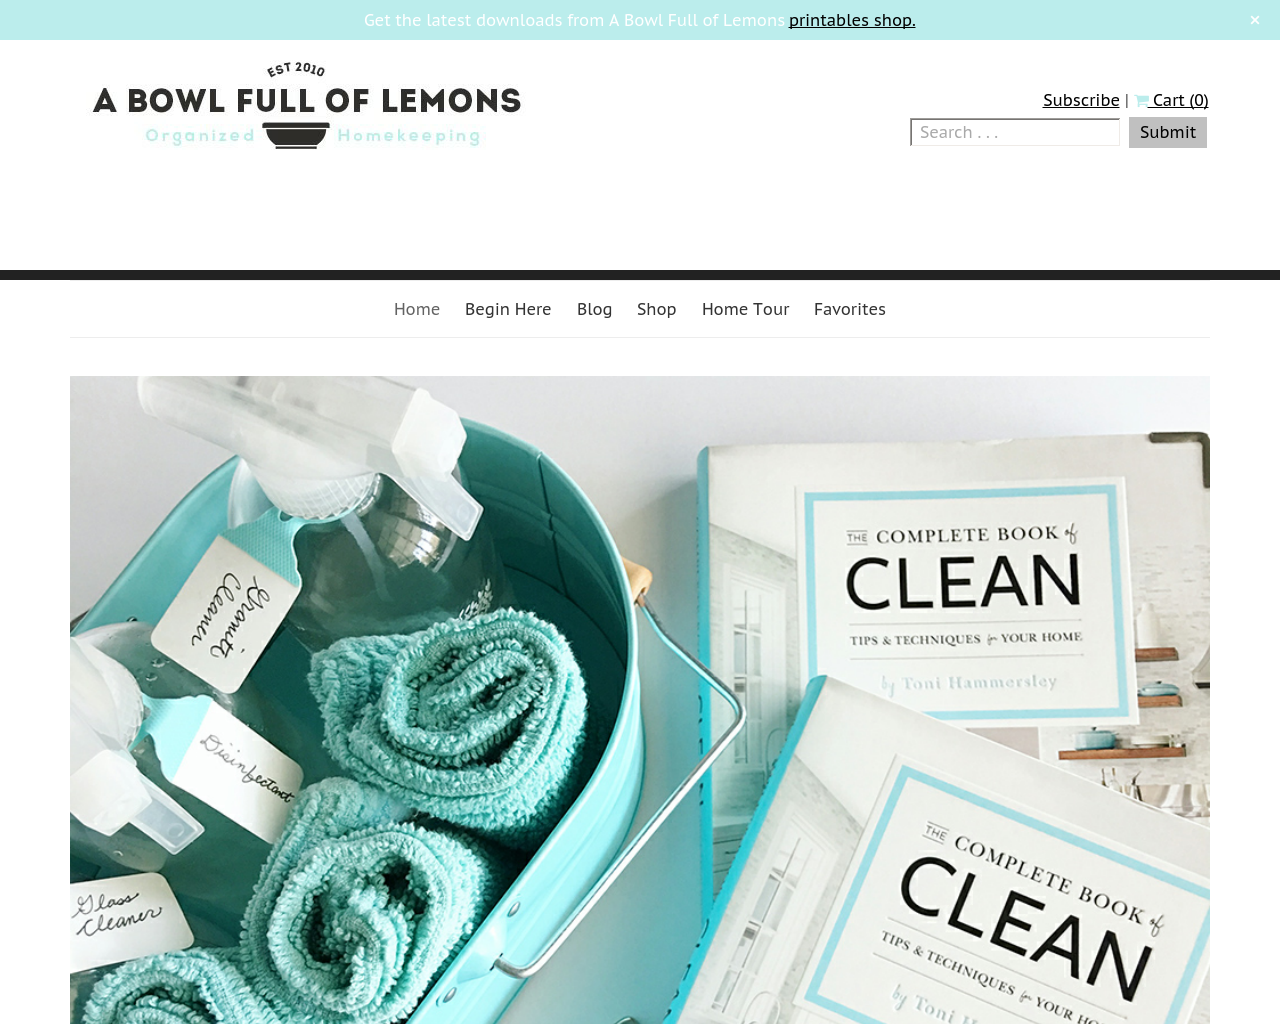 A-Bowl-Full-Of-Lemons-Advertising-Reviews-Pricing